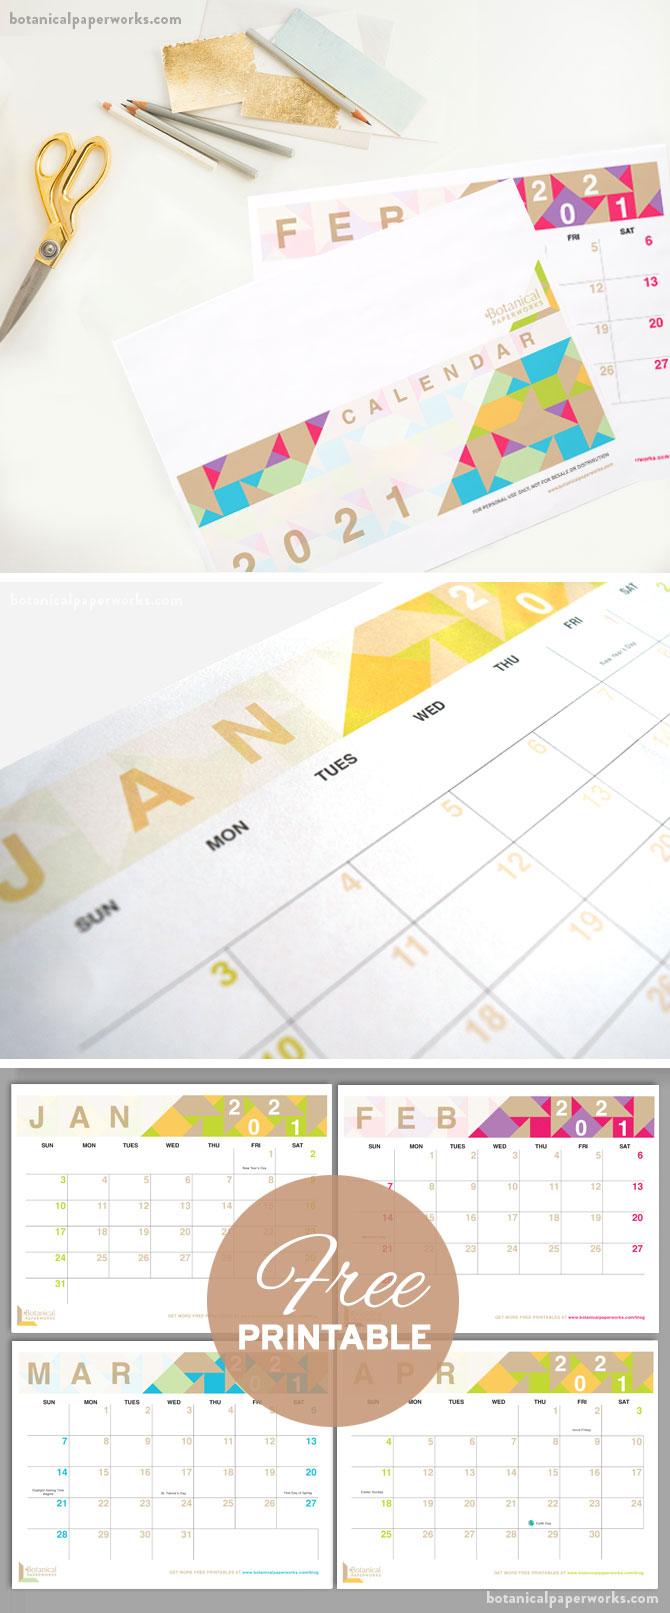 free printable geometric style calendar for 2021